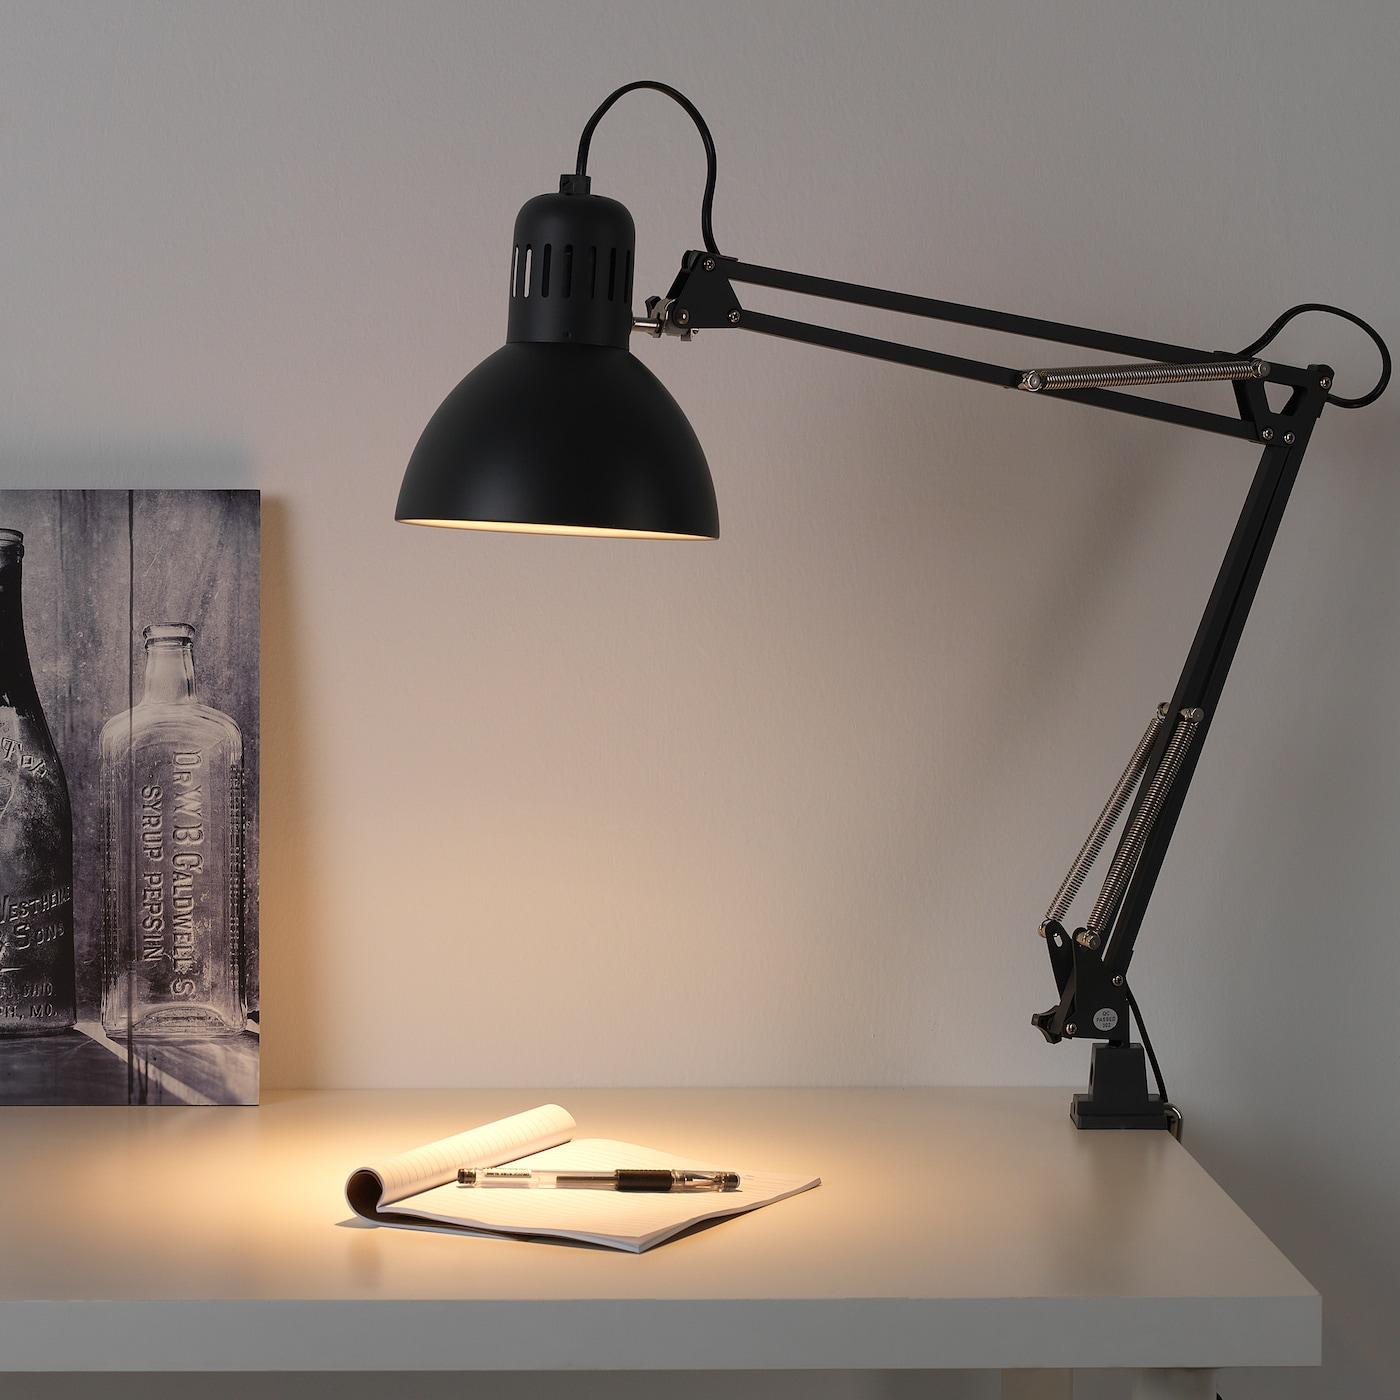 IKEA TERTIAL DARK GREY DESK WORK LAMP ARM AND HEAD ARE